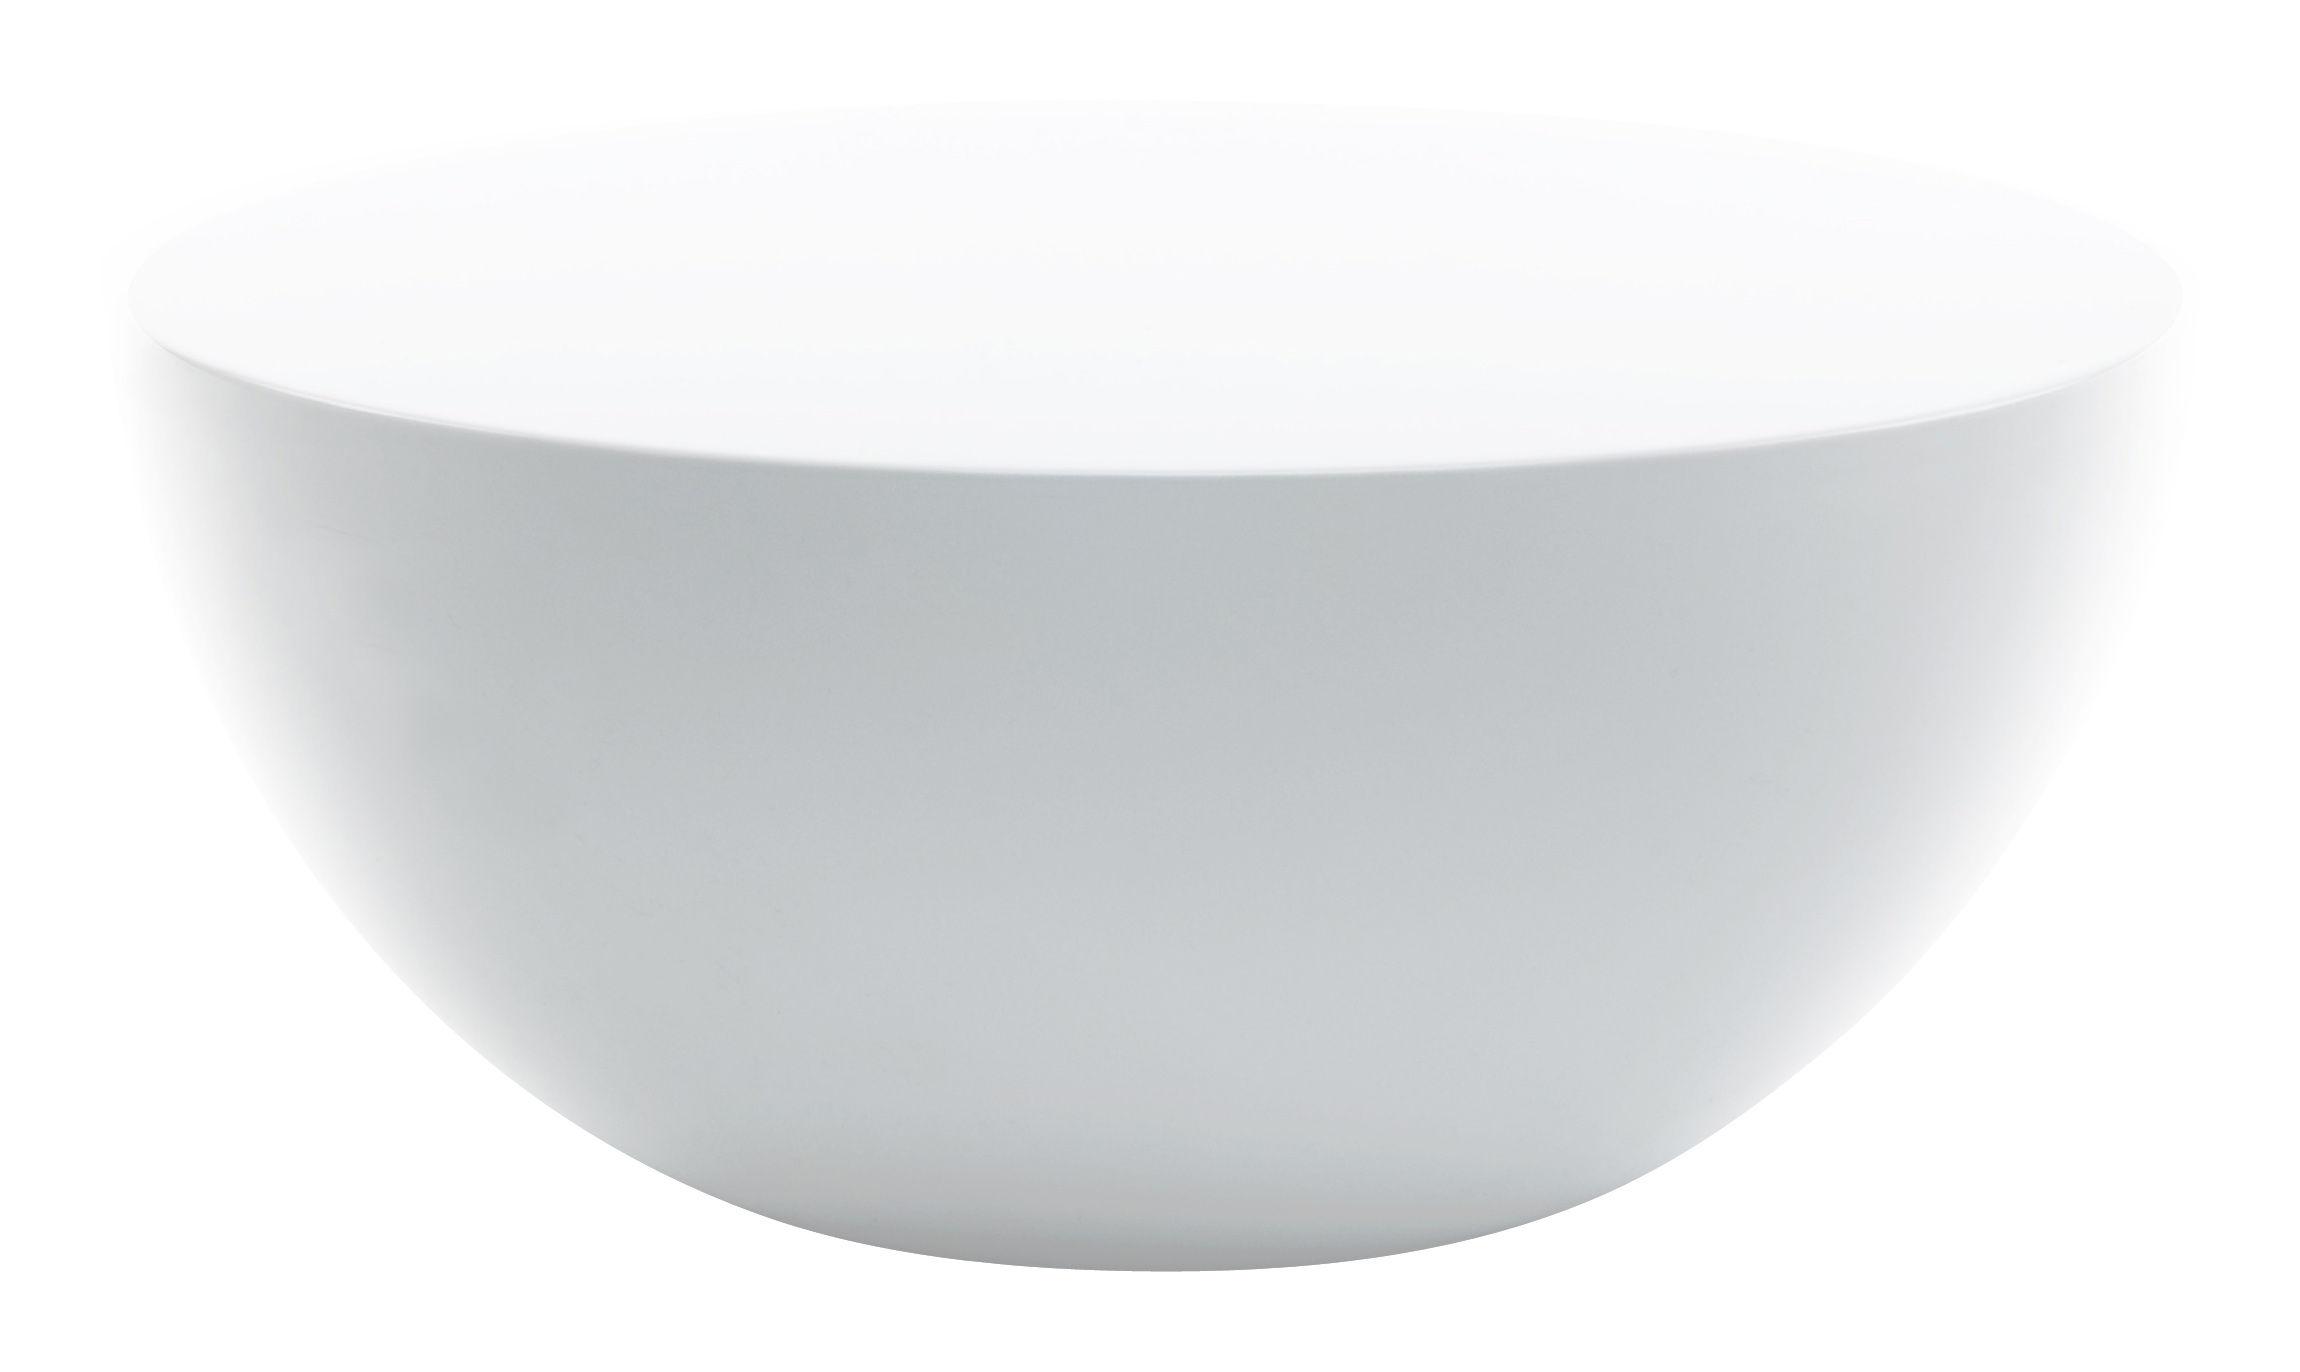 Möbel - Couchtische - Slice Couchtisch - XL Boom - Weiß - ABS recyclé laqué